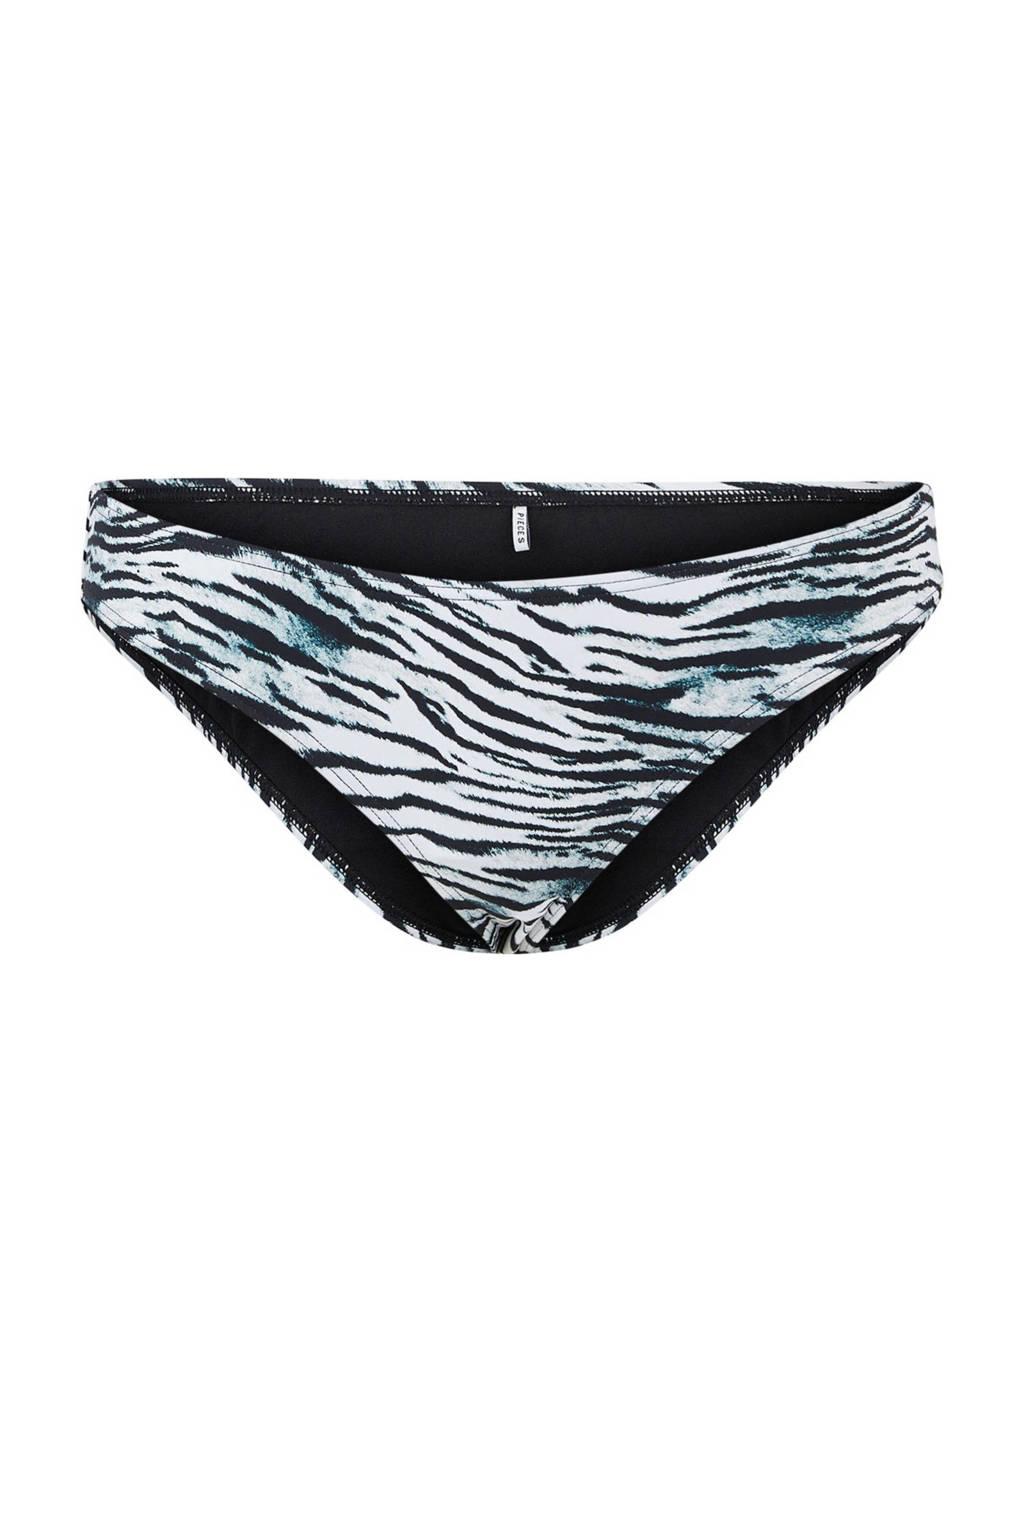 PIECES bikinibroekje Gaomi met zebraprint zwart/wit, Zwart/wit